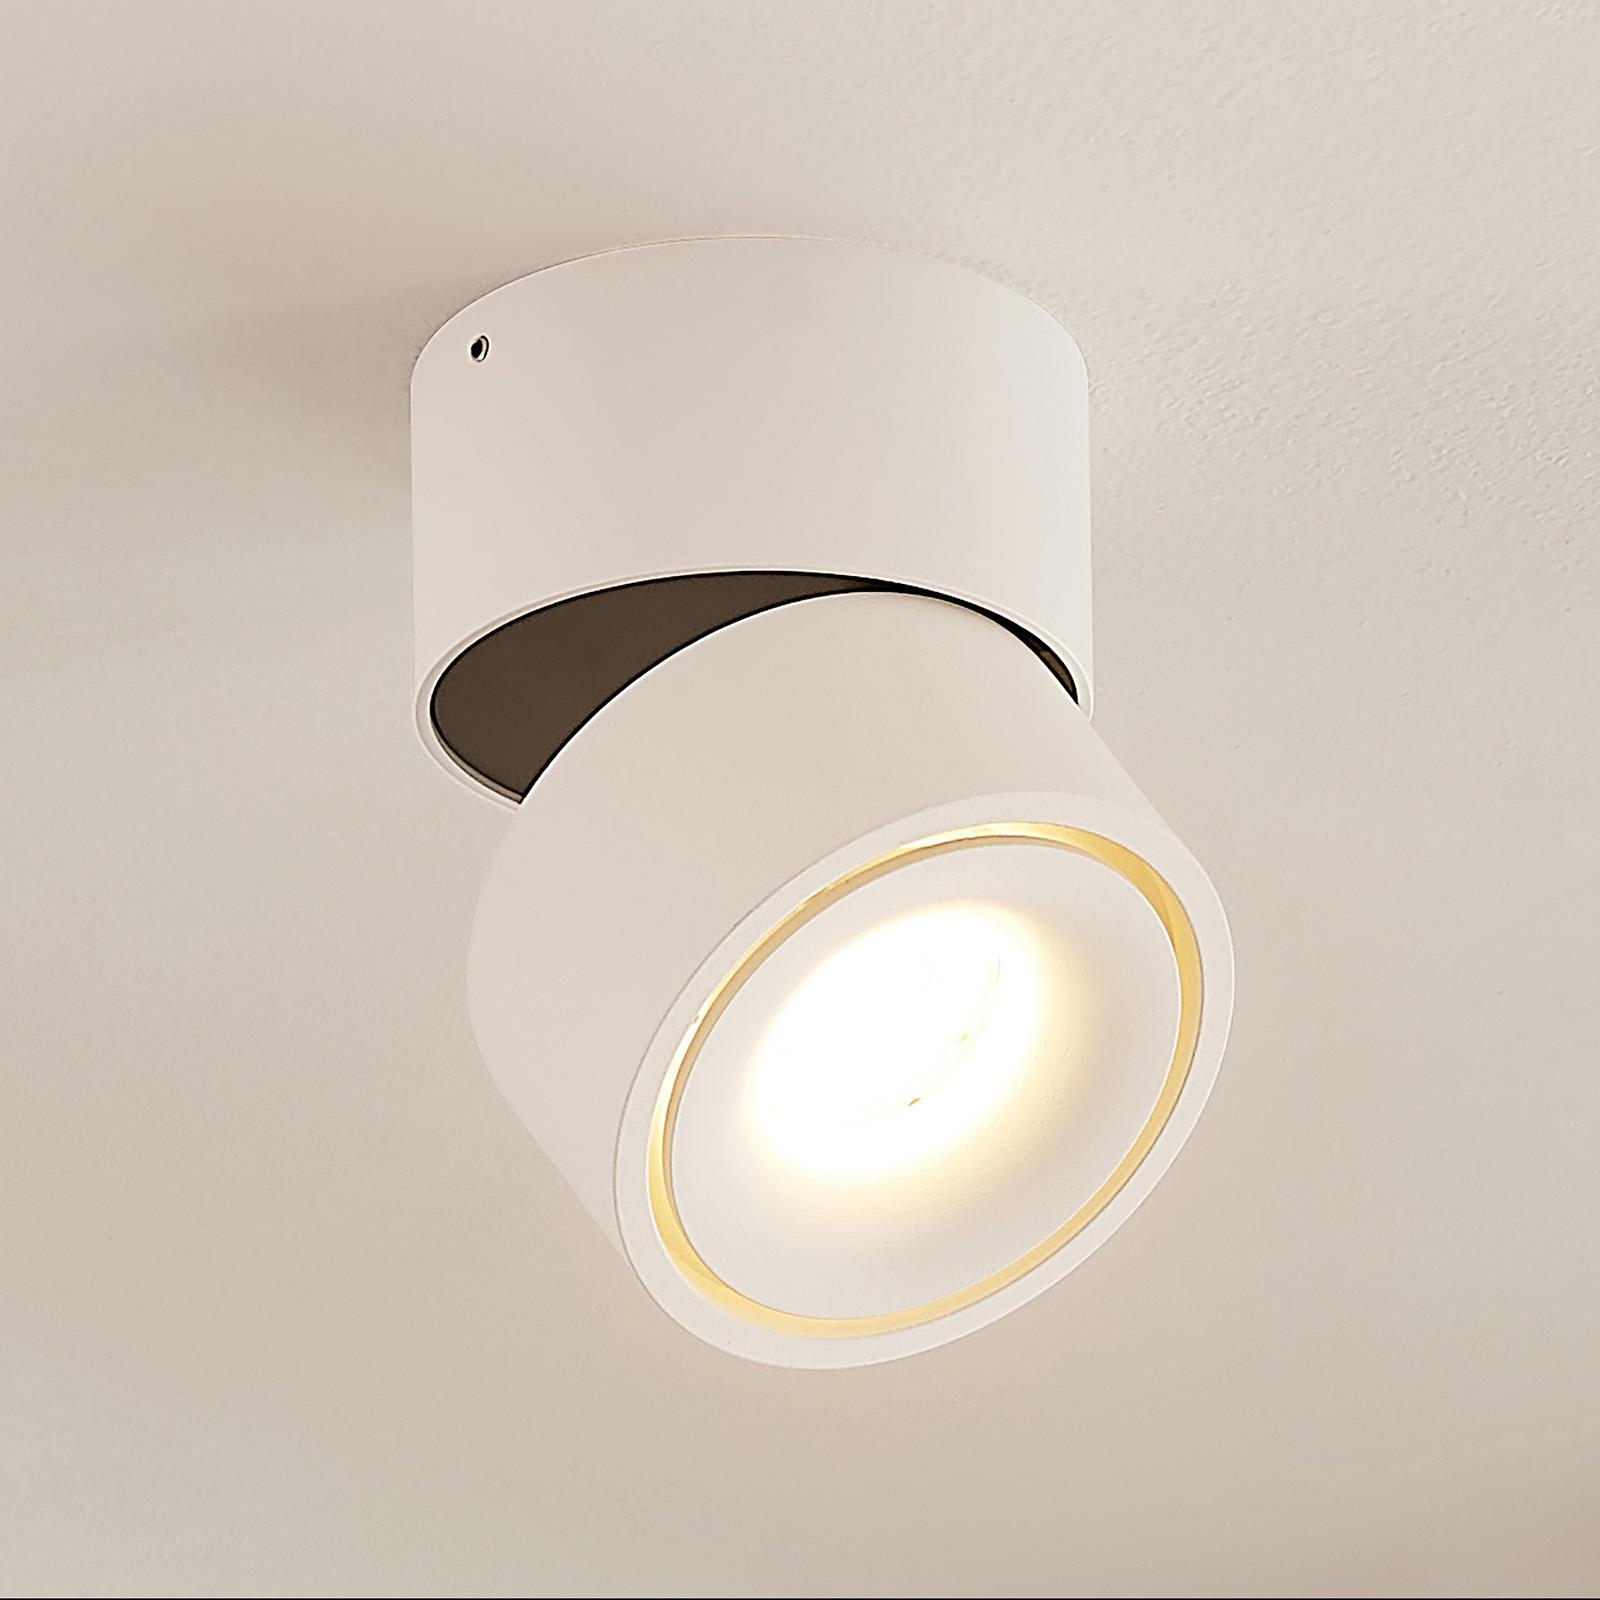 Arcchio Rotari spot sufitowy LED 1-punktowy 8,9W